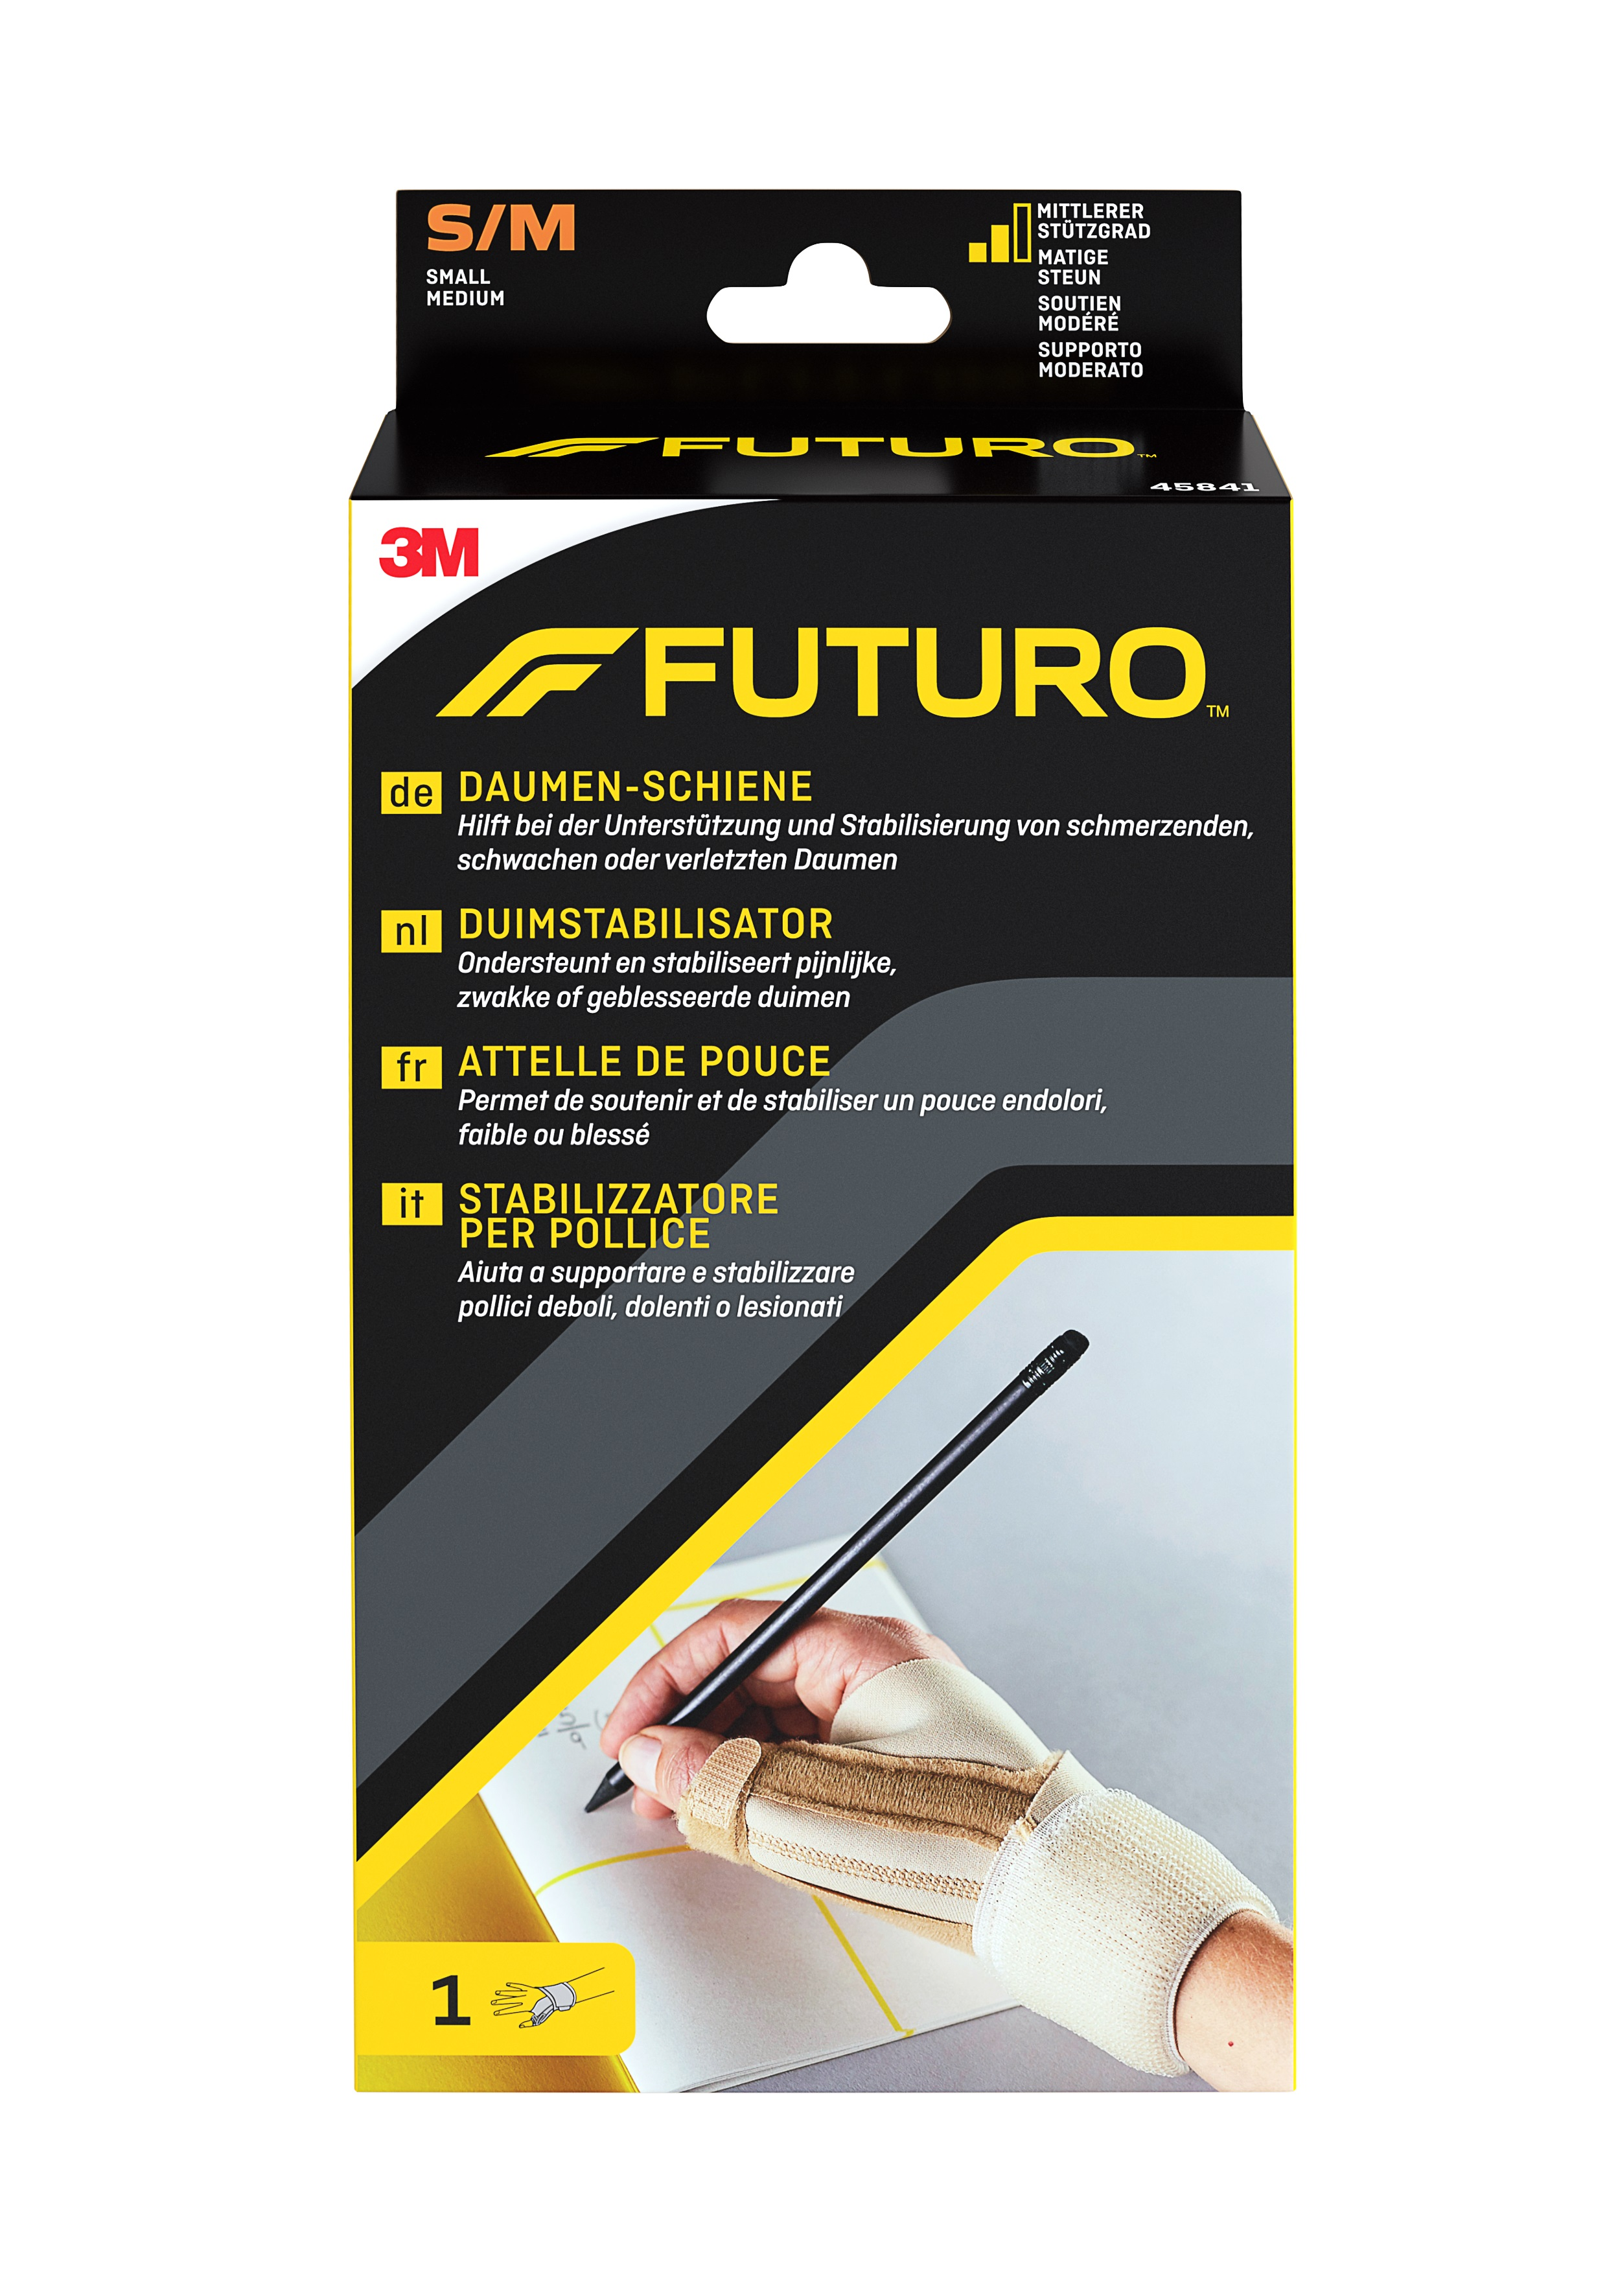 FUTURO™ Daumen-Schiene